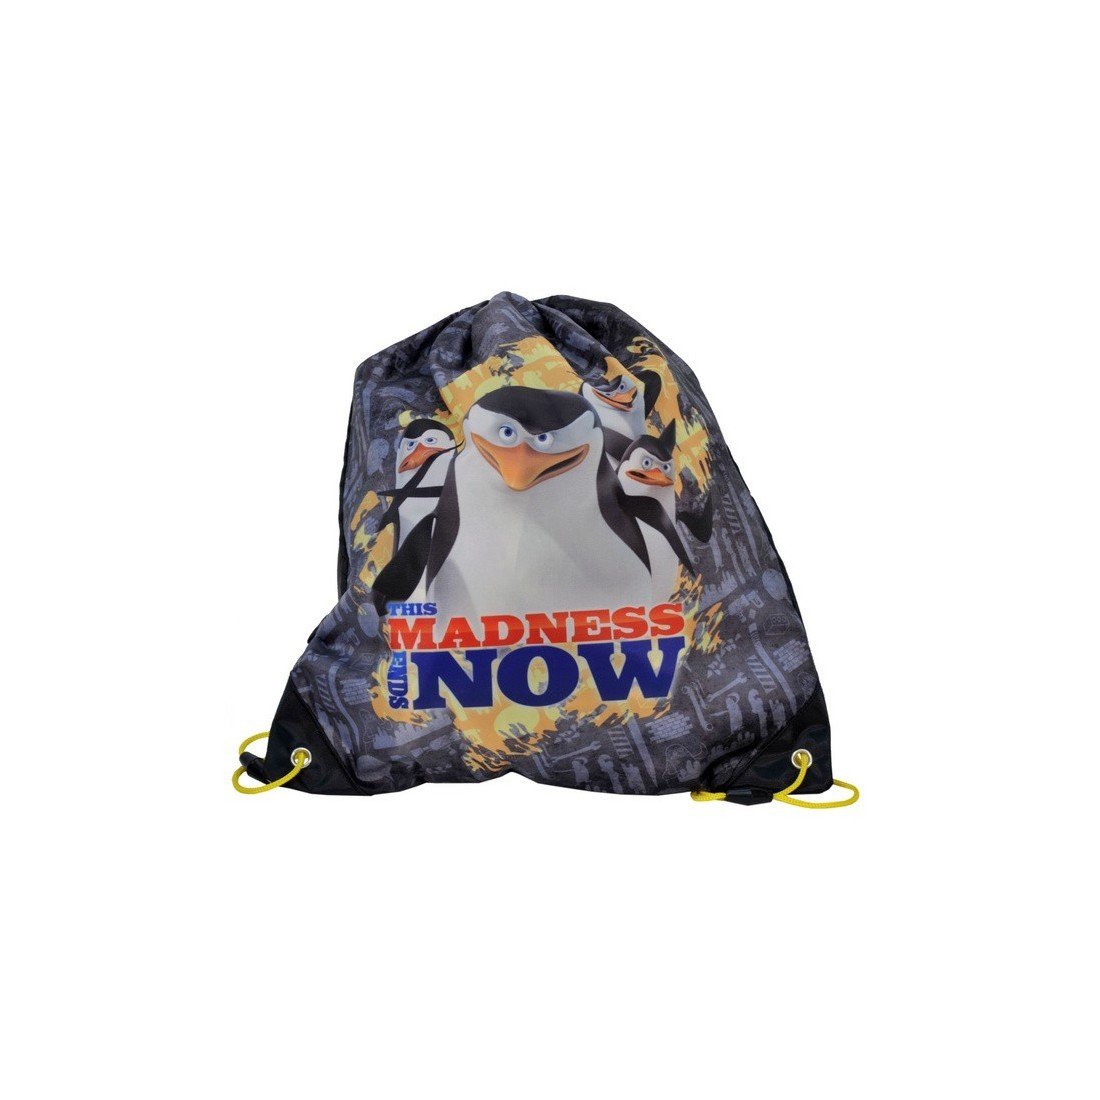 Worek Pingwiny z Madagaskaru madness - plecak-tornister.pl